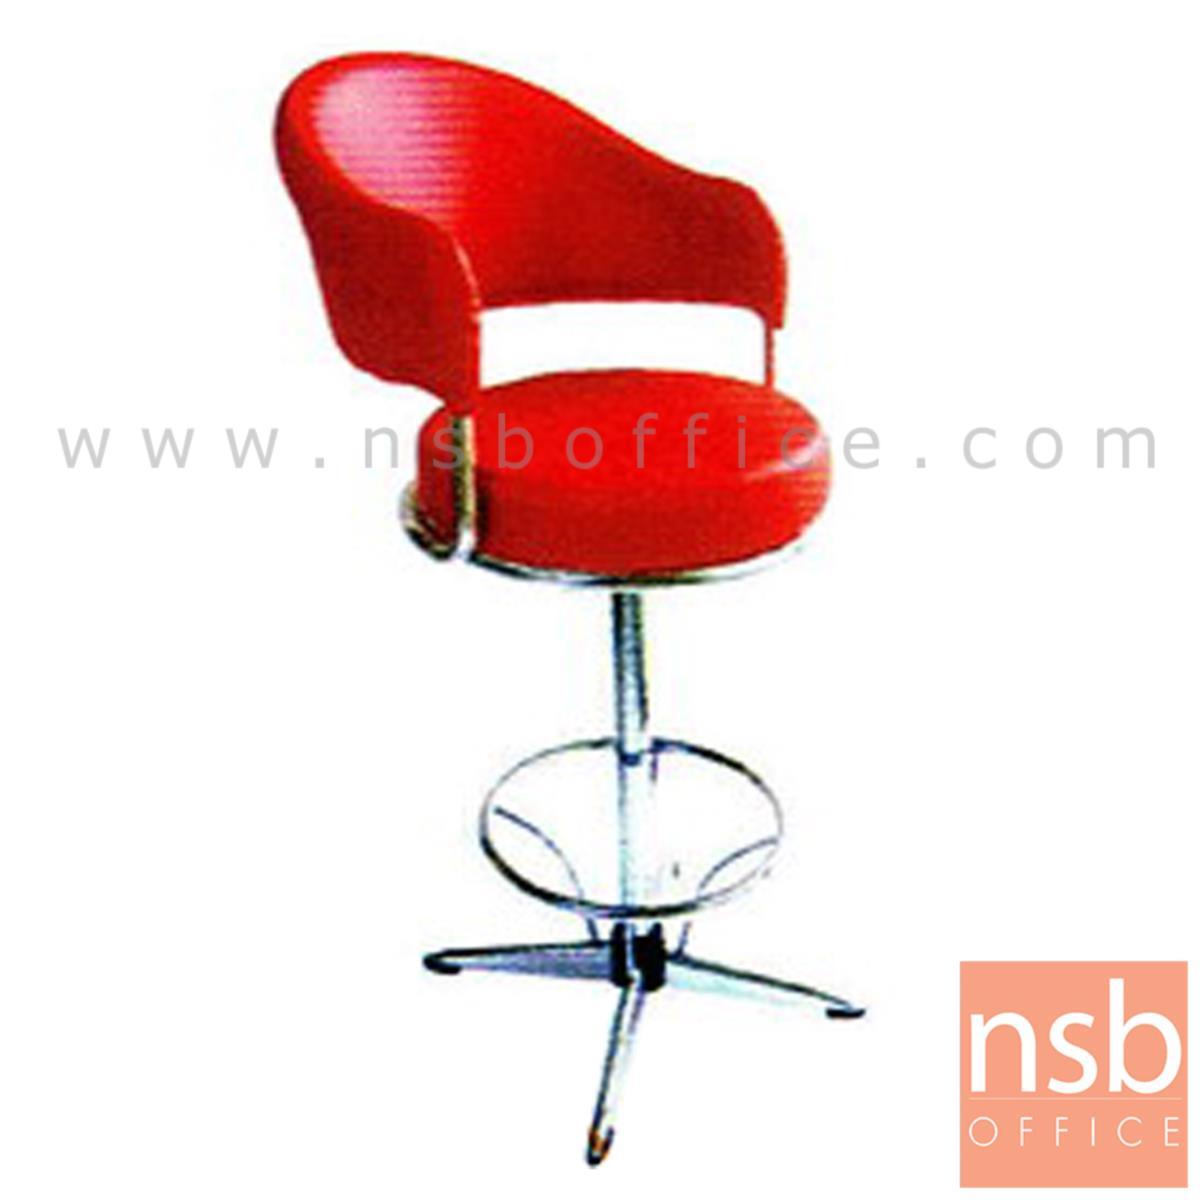 B09A022:เก้าอี้บาร์ที่นั่งกลม รุ่น CS-007 ขาเหล็ก